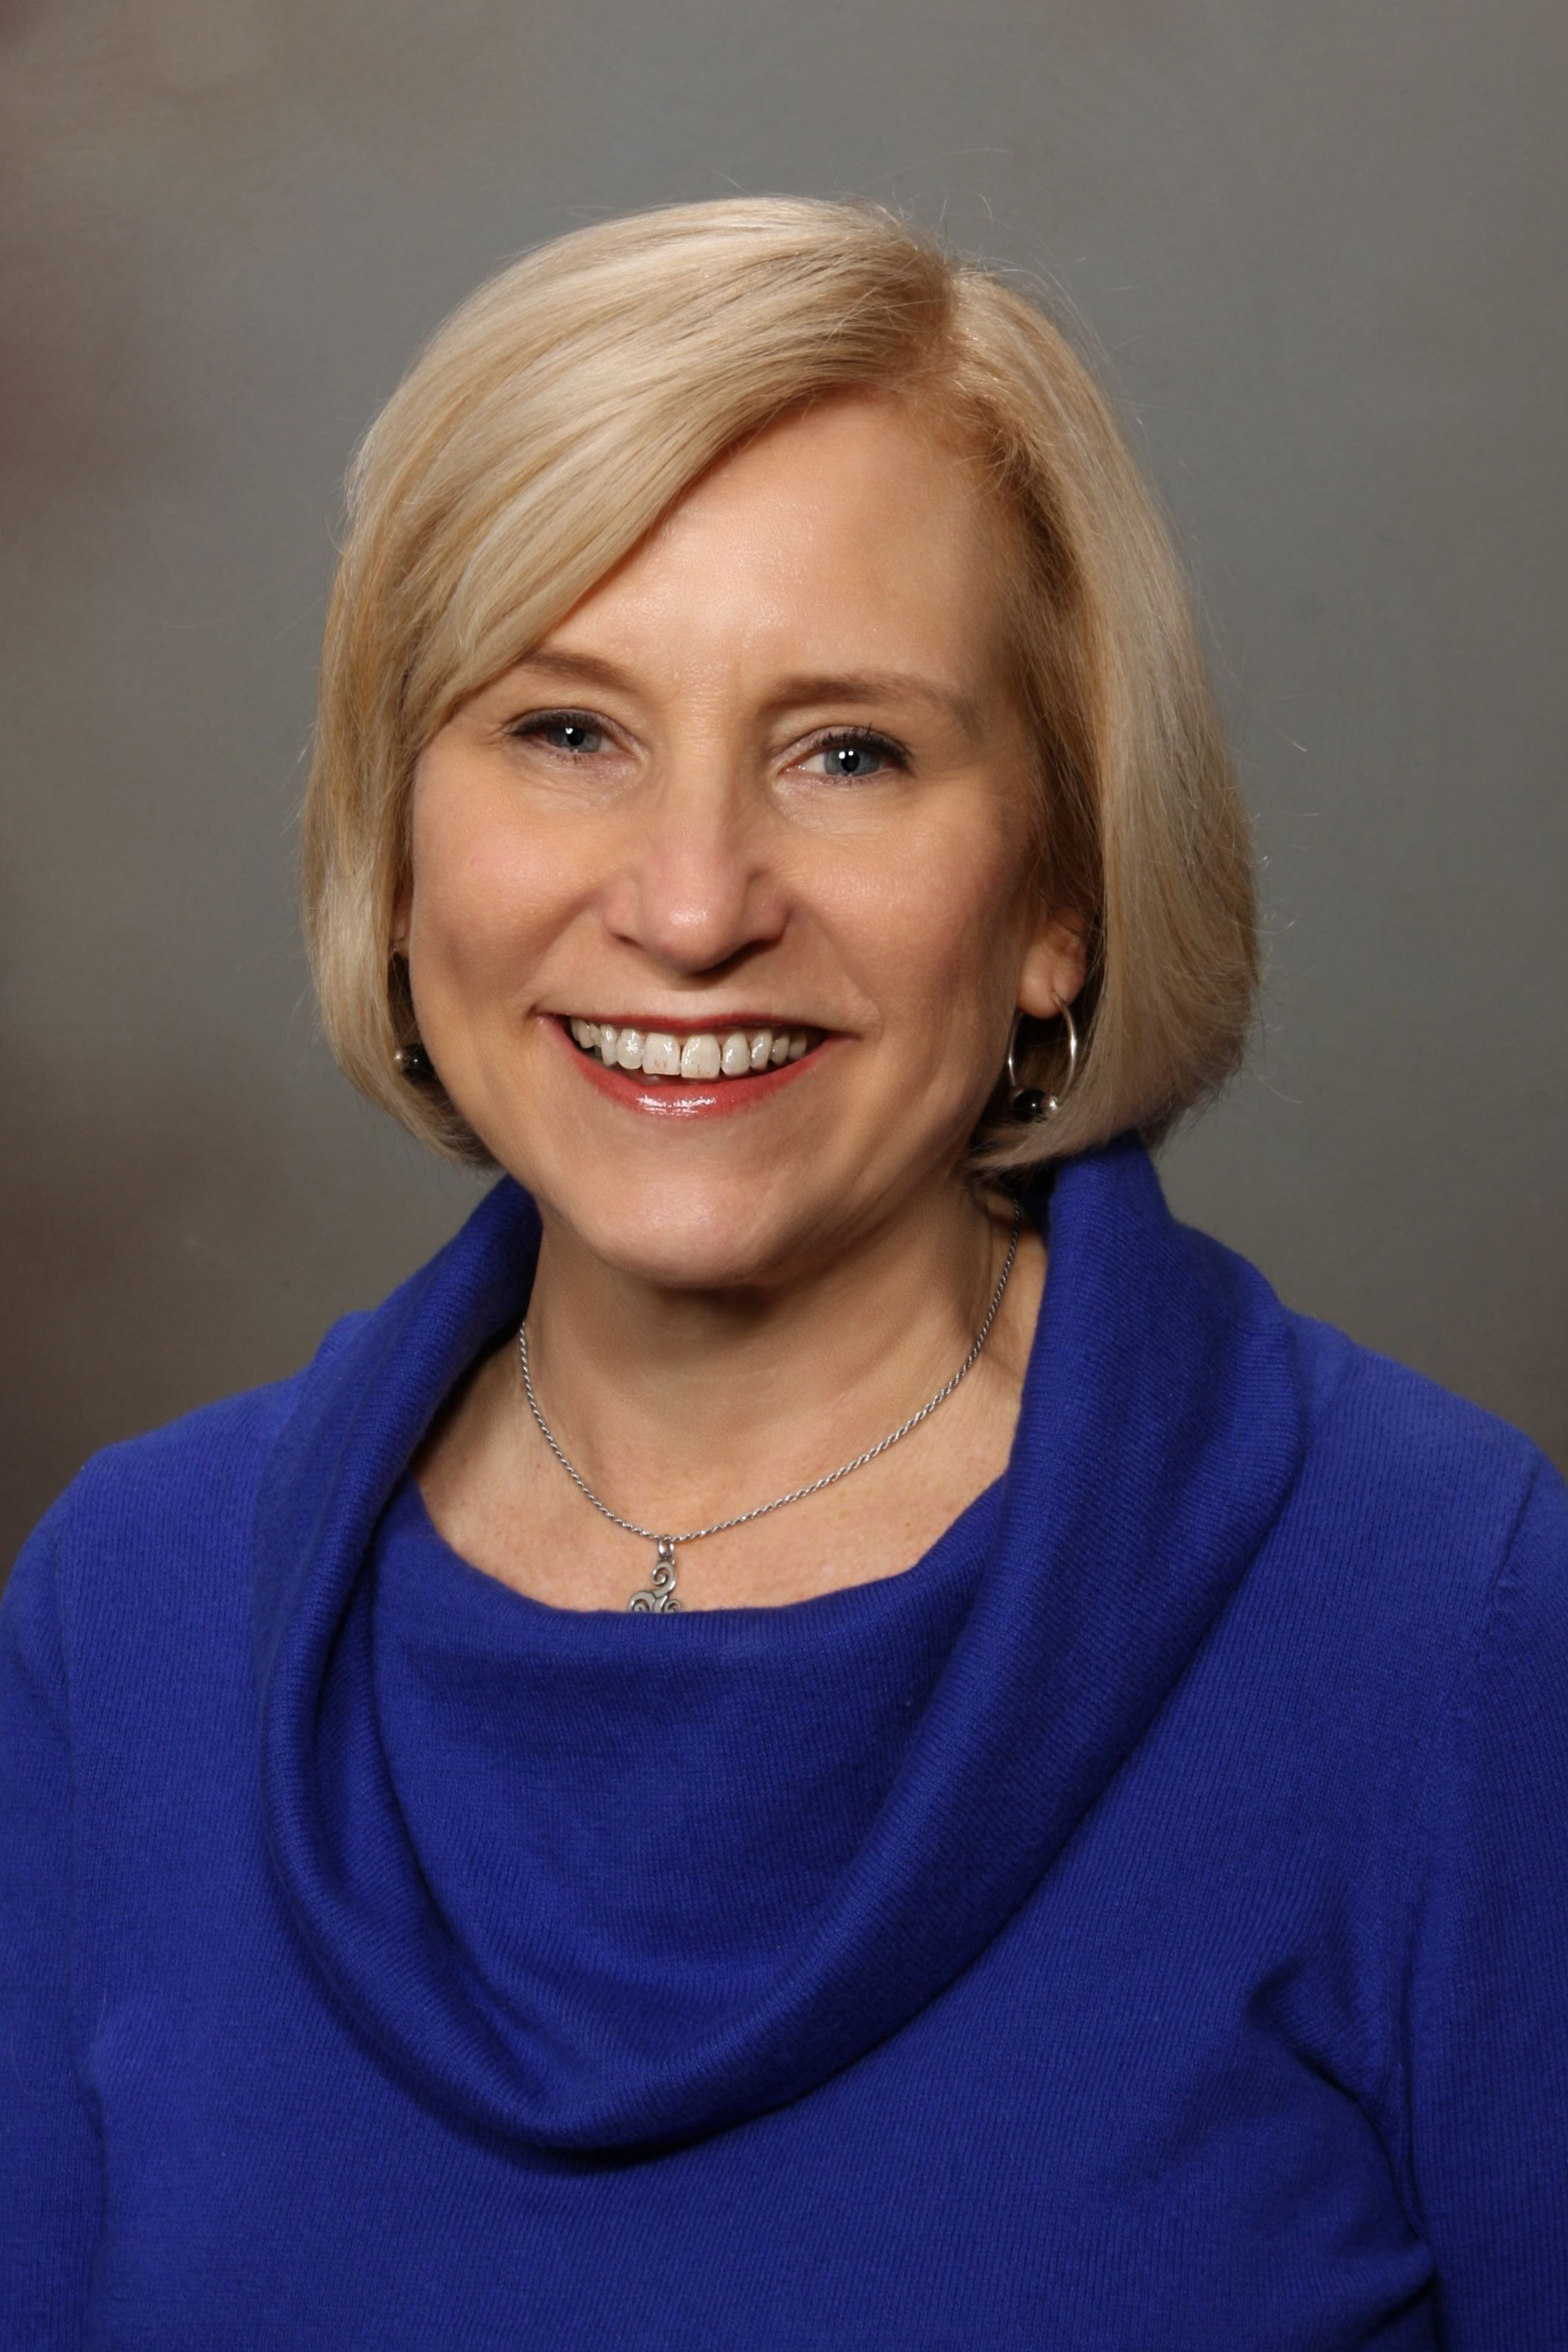 Charlotte A. Graf